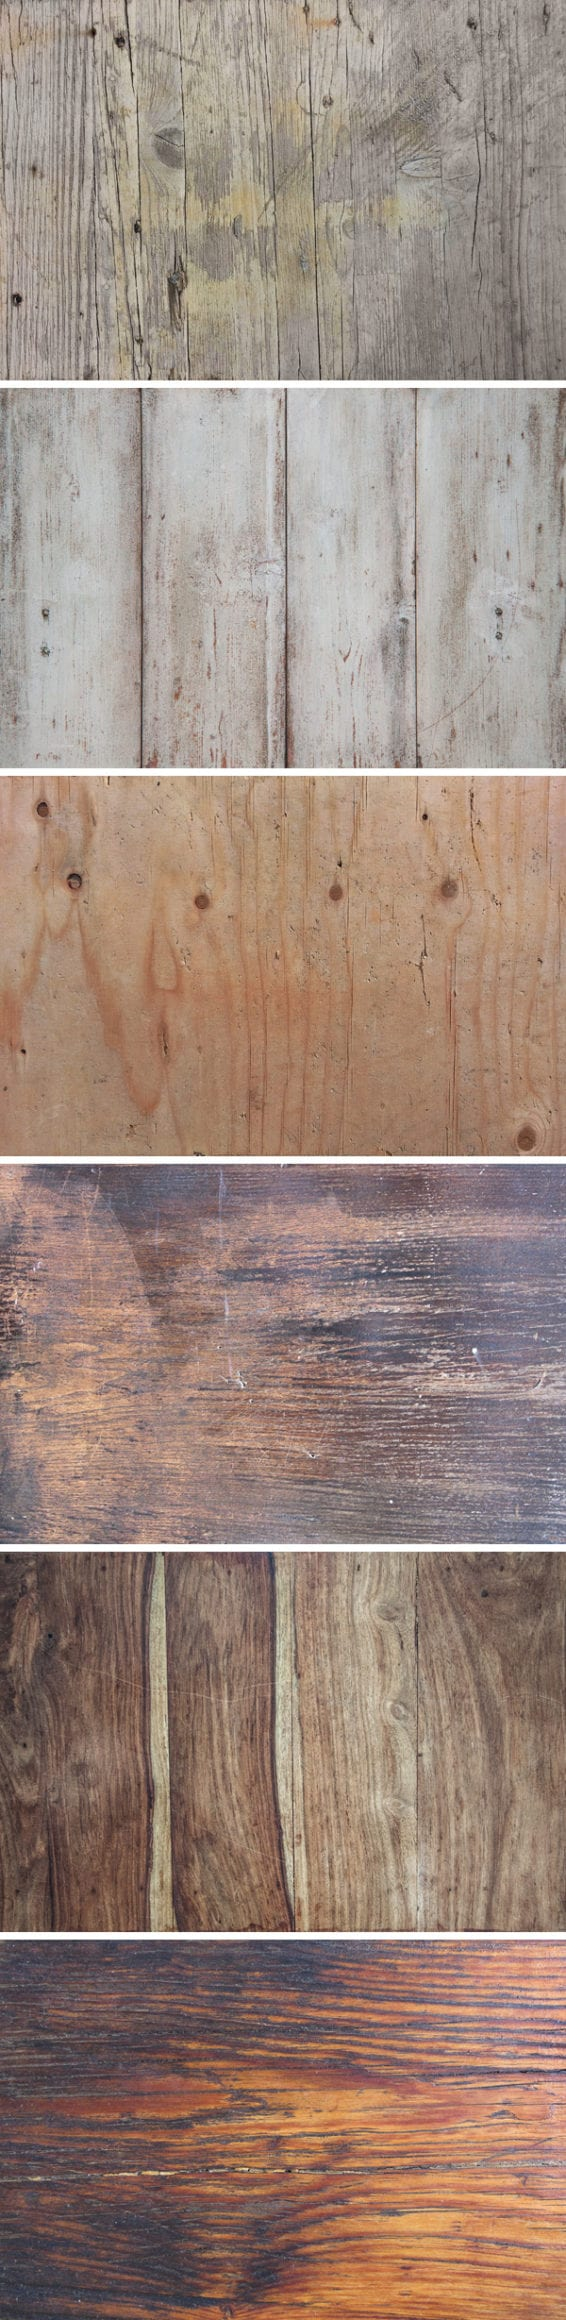 6-Vintage-Wood-Textures-3-600